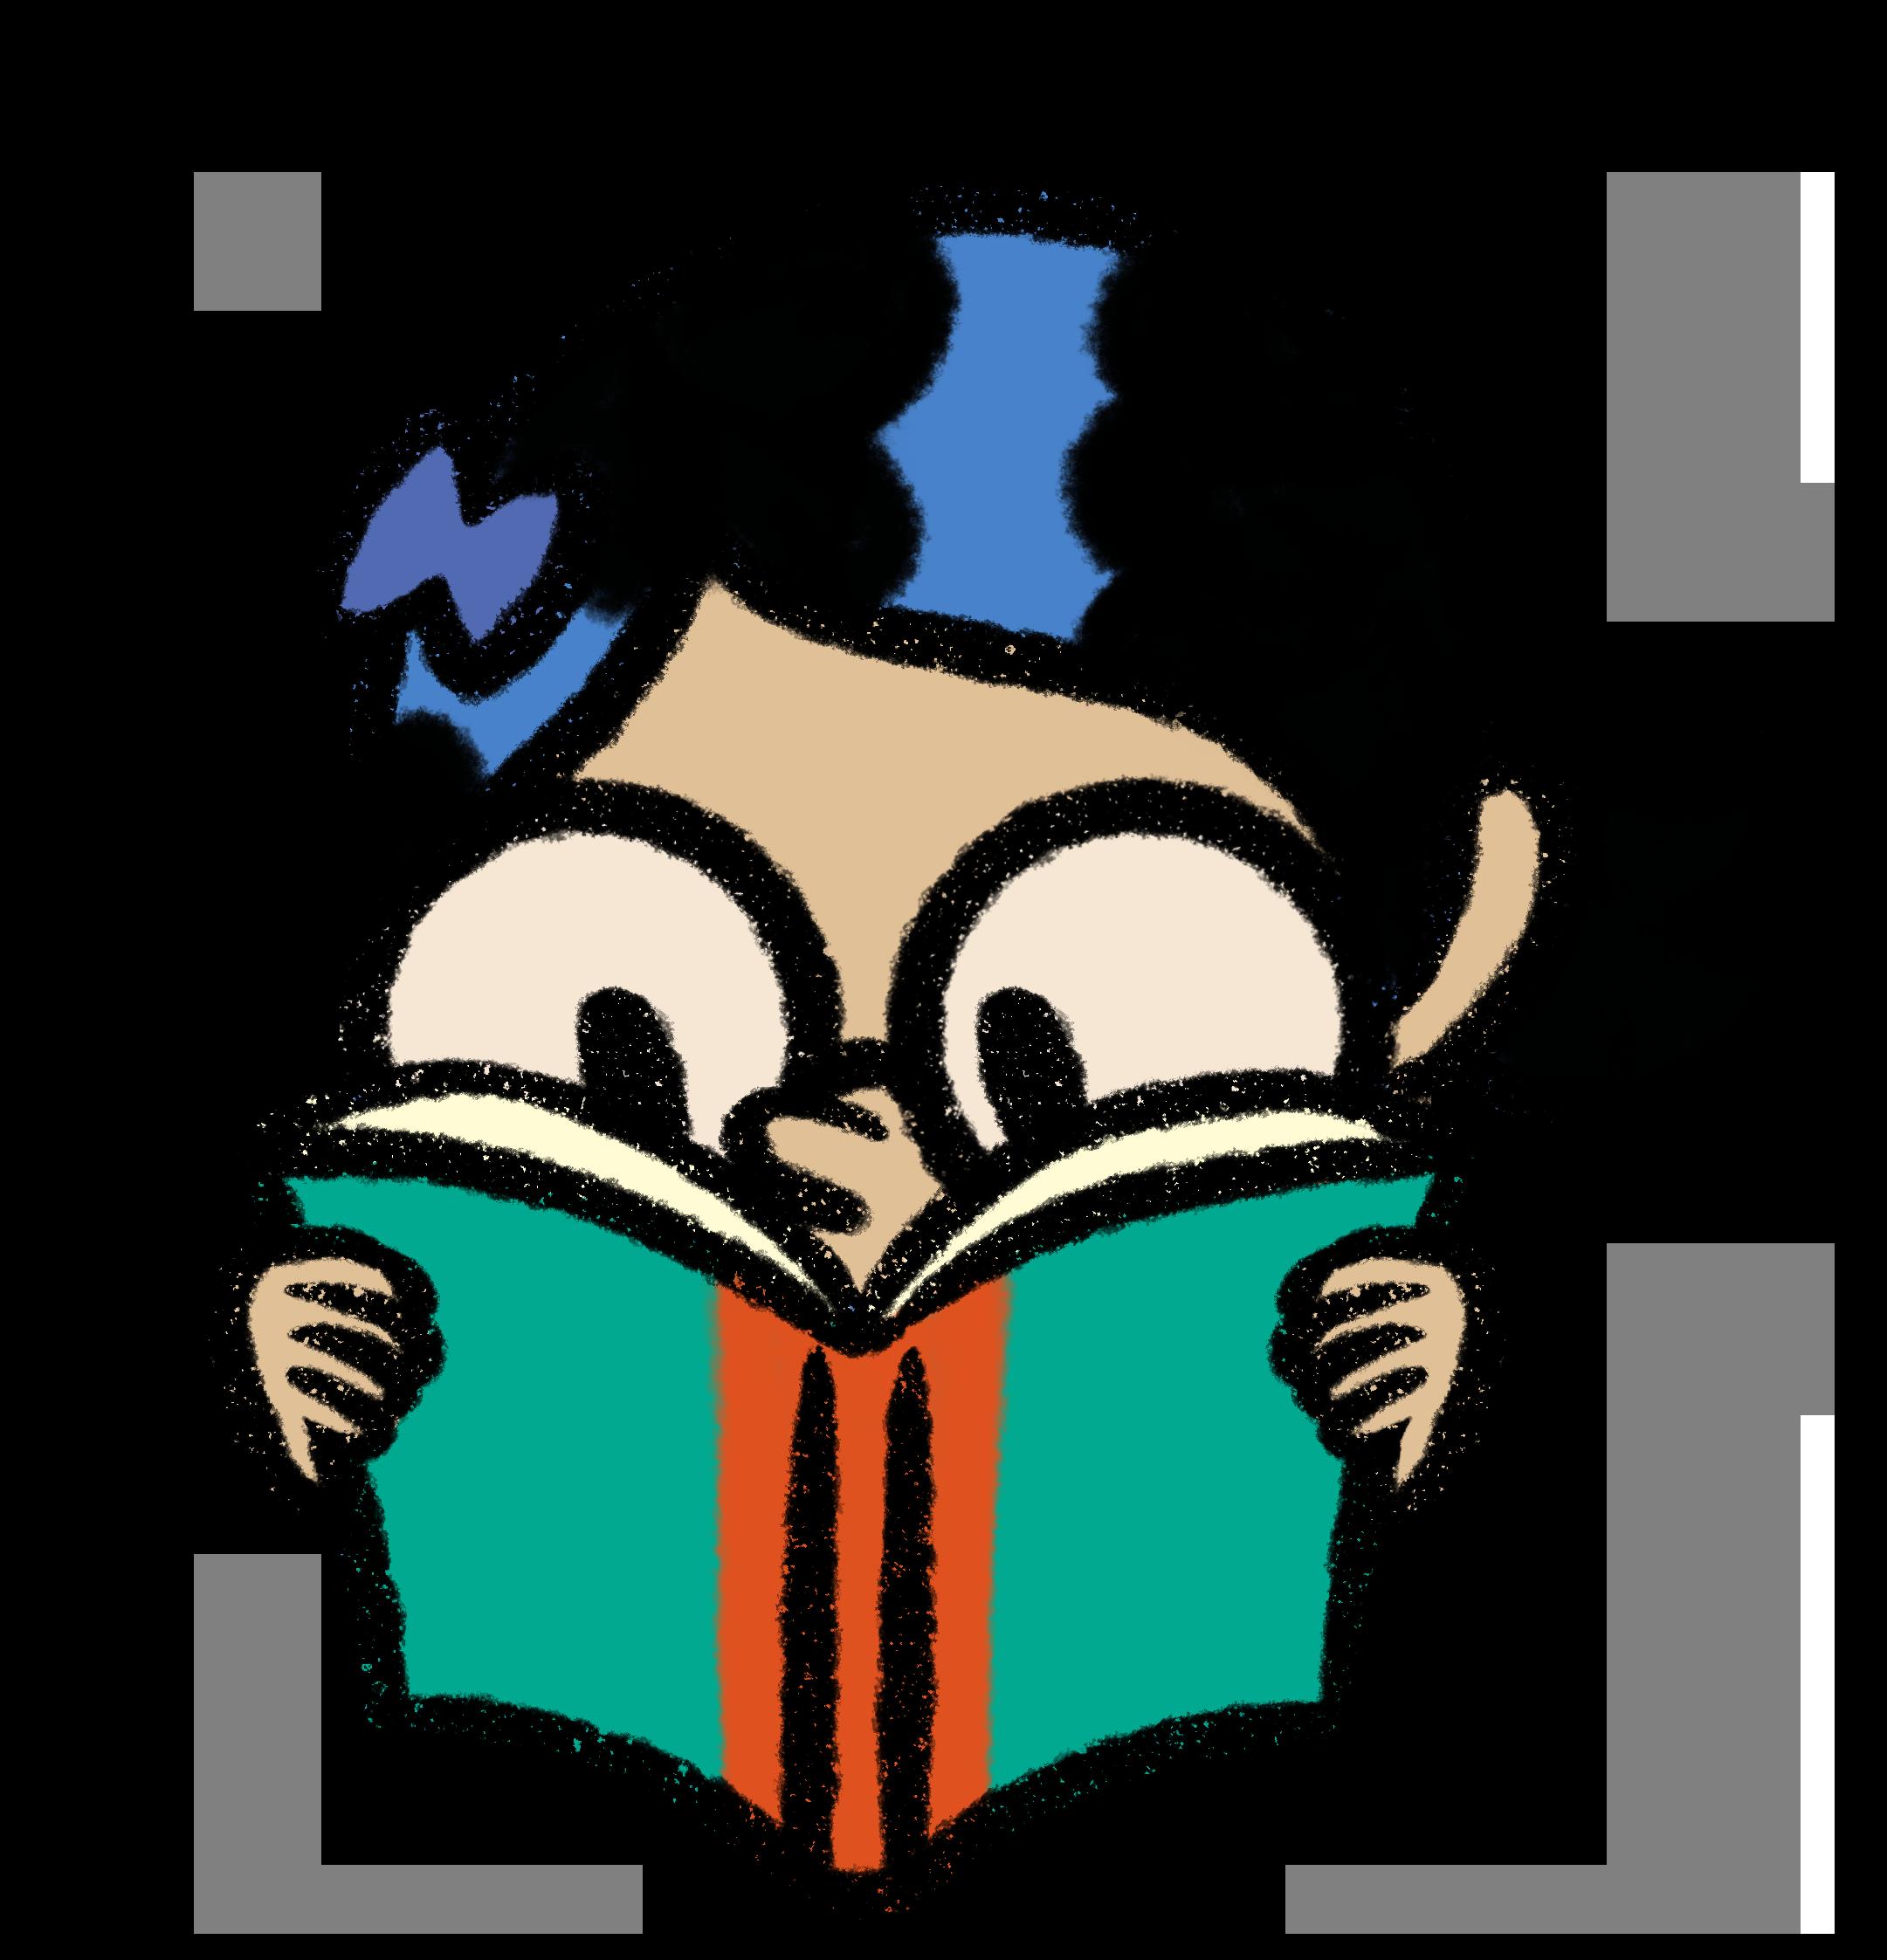 personajes-leyendo-3.png